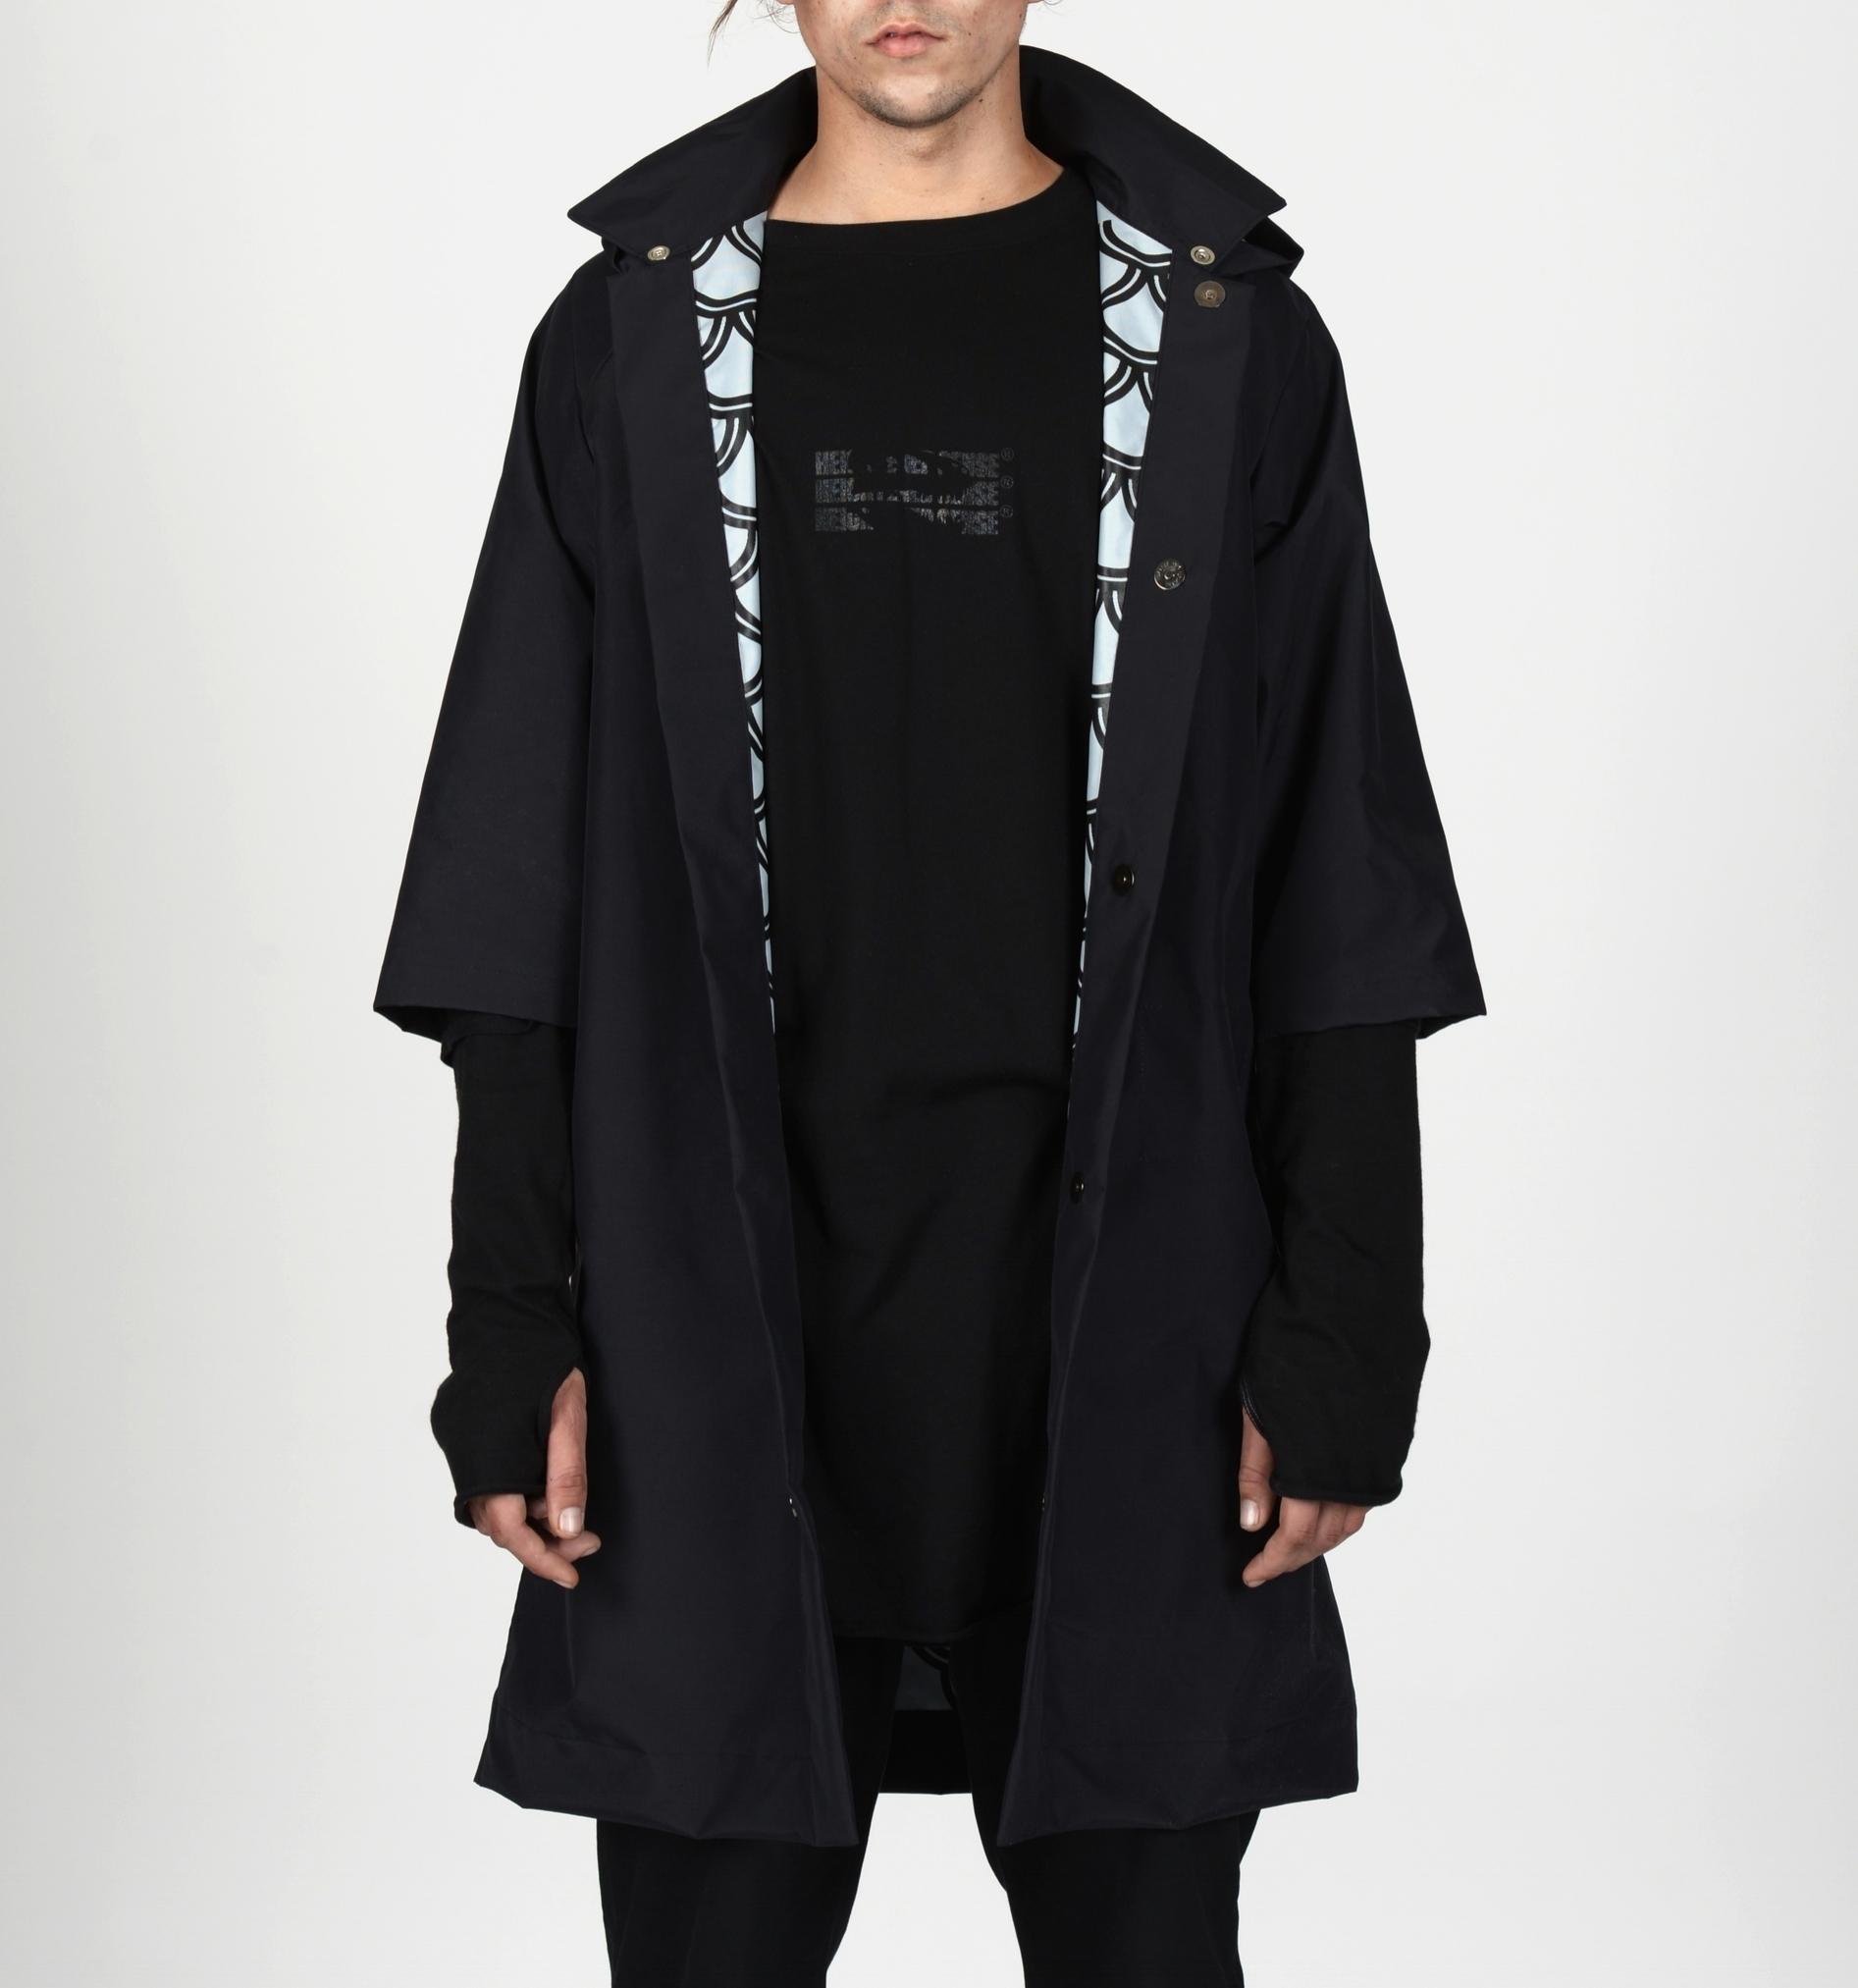 01 Heightened Sense Black Dragon Coat.jpg